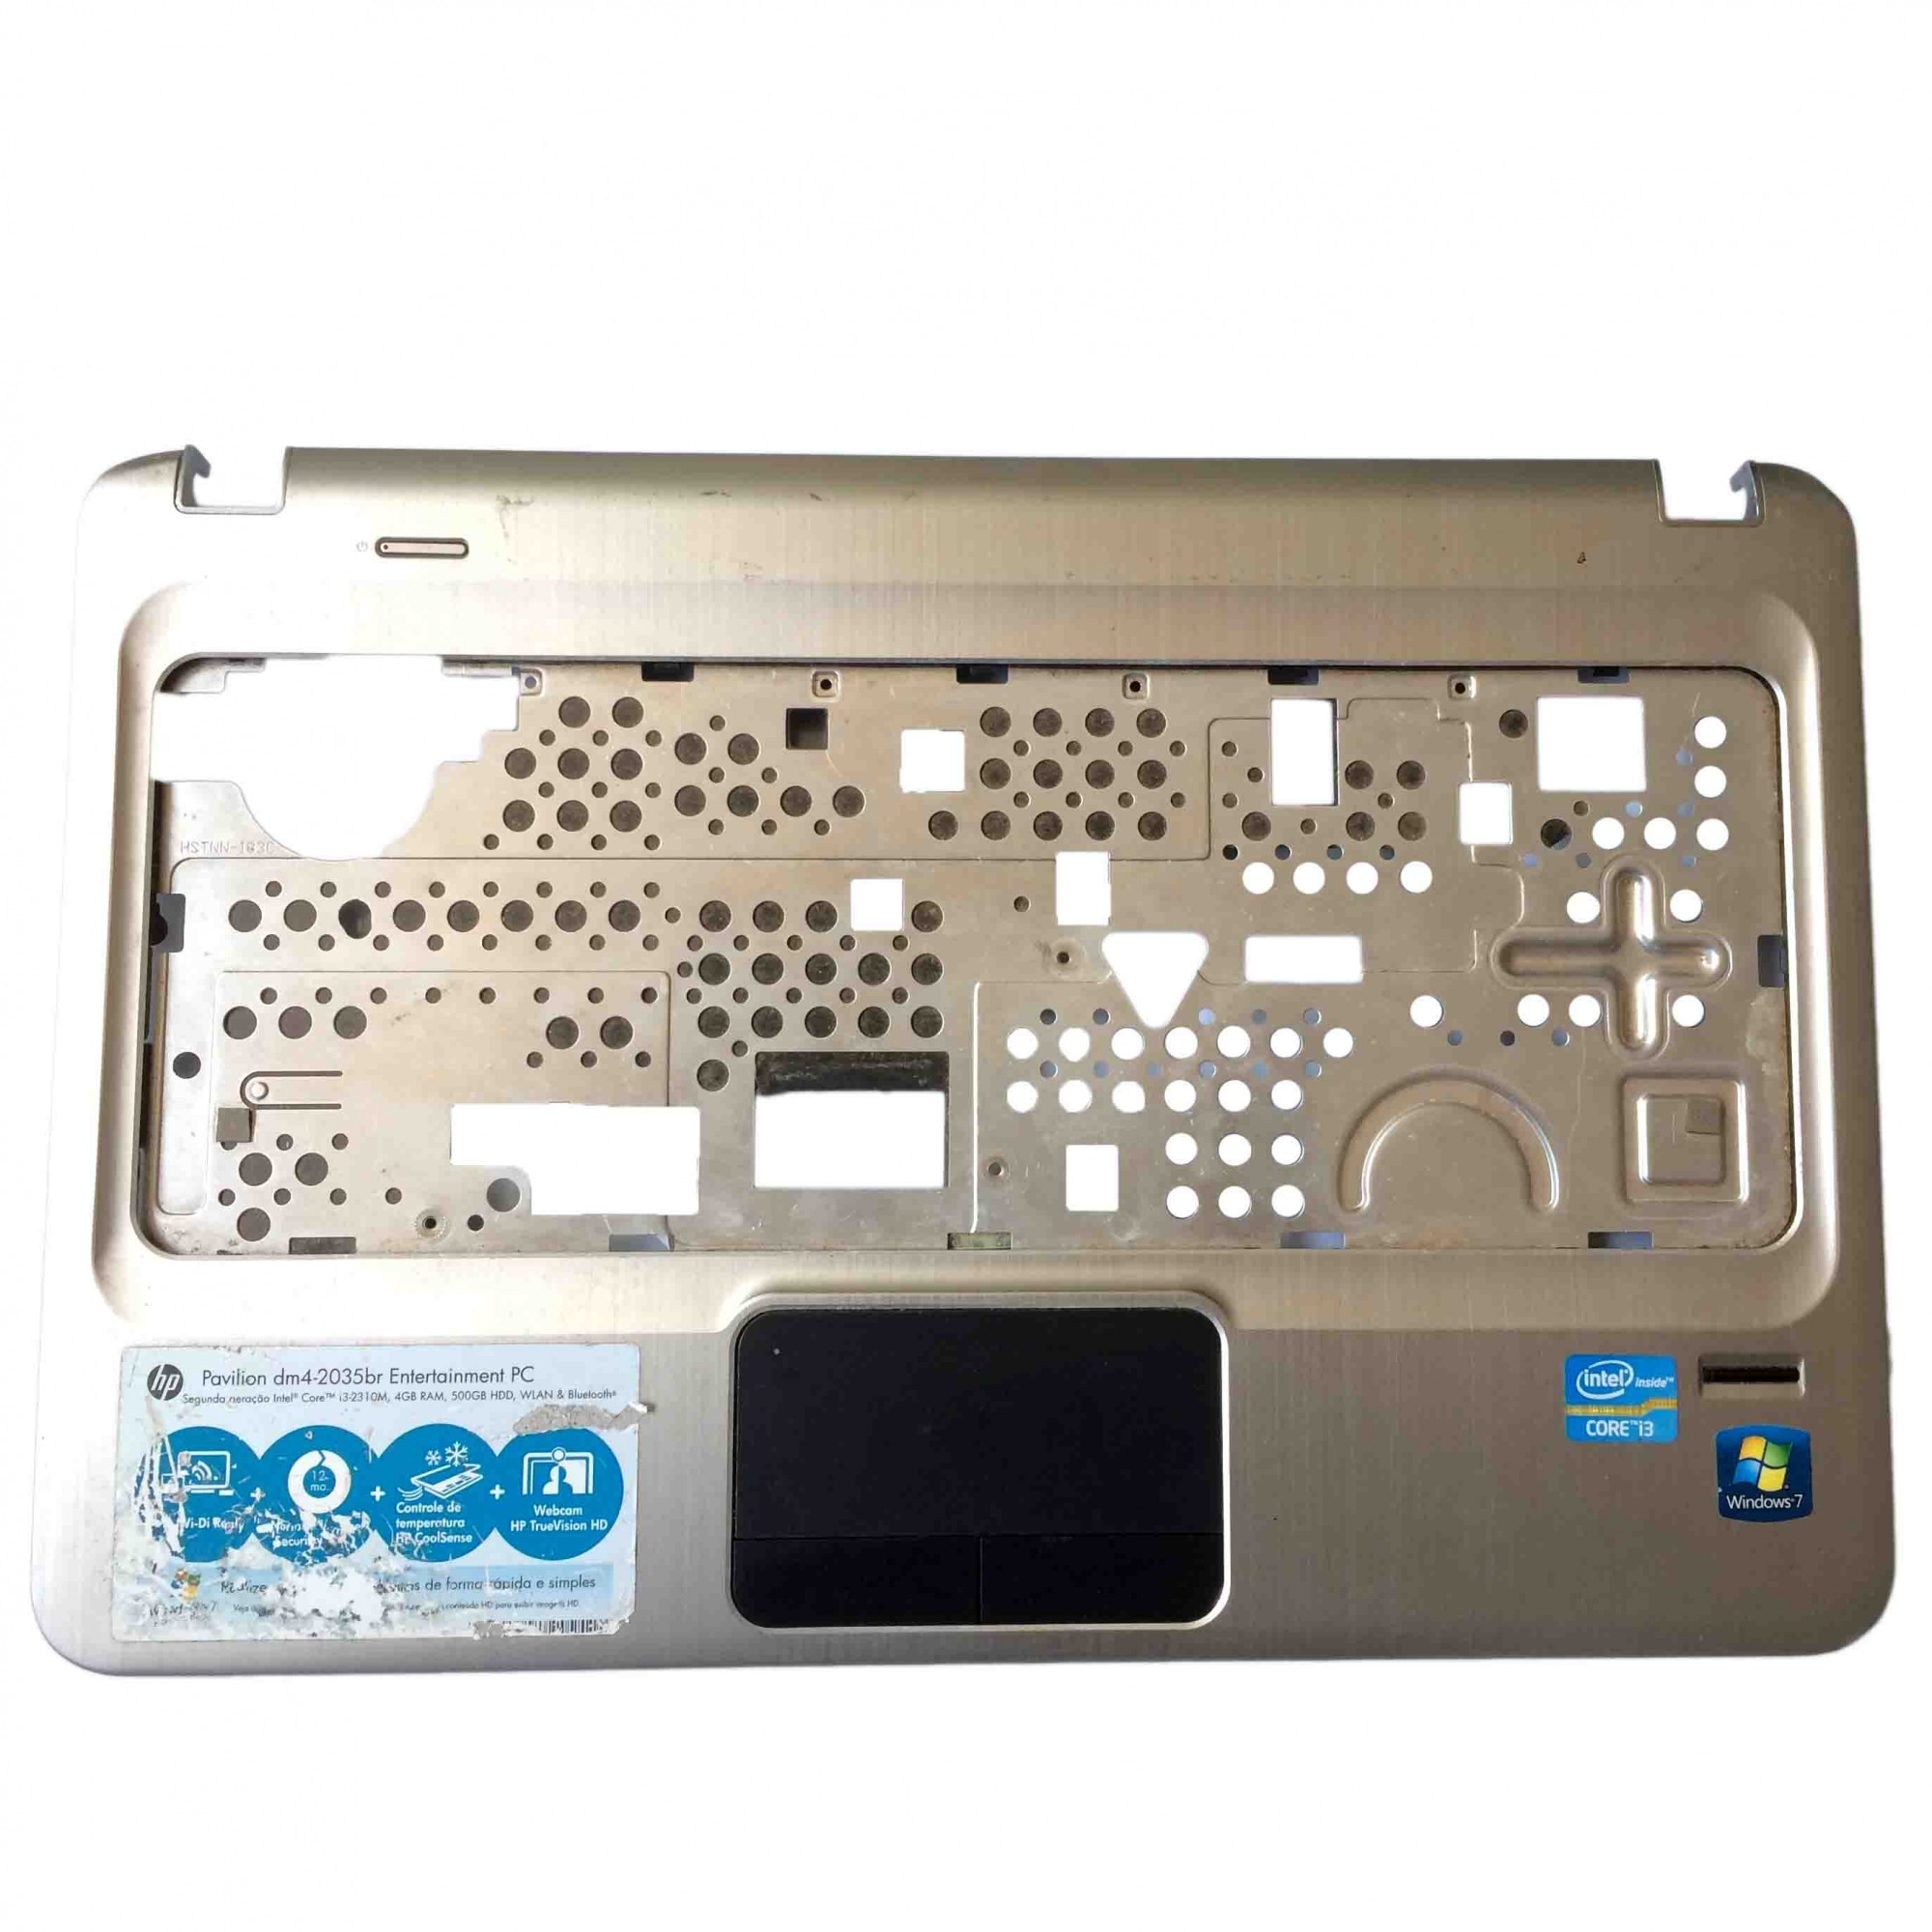 Carcaça Base Superior + TouchPad + Biometria + Flats Notebook HP Pavilion dm4-2035br PN:6070b0487902 - Retirado